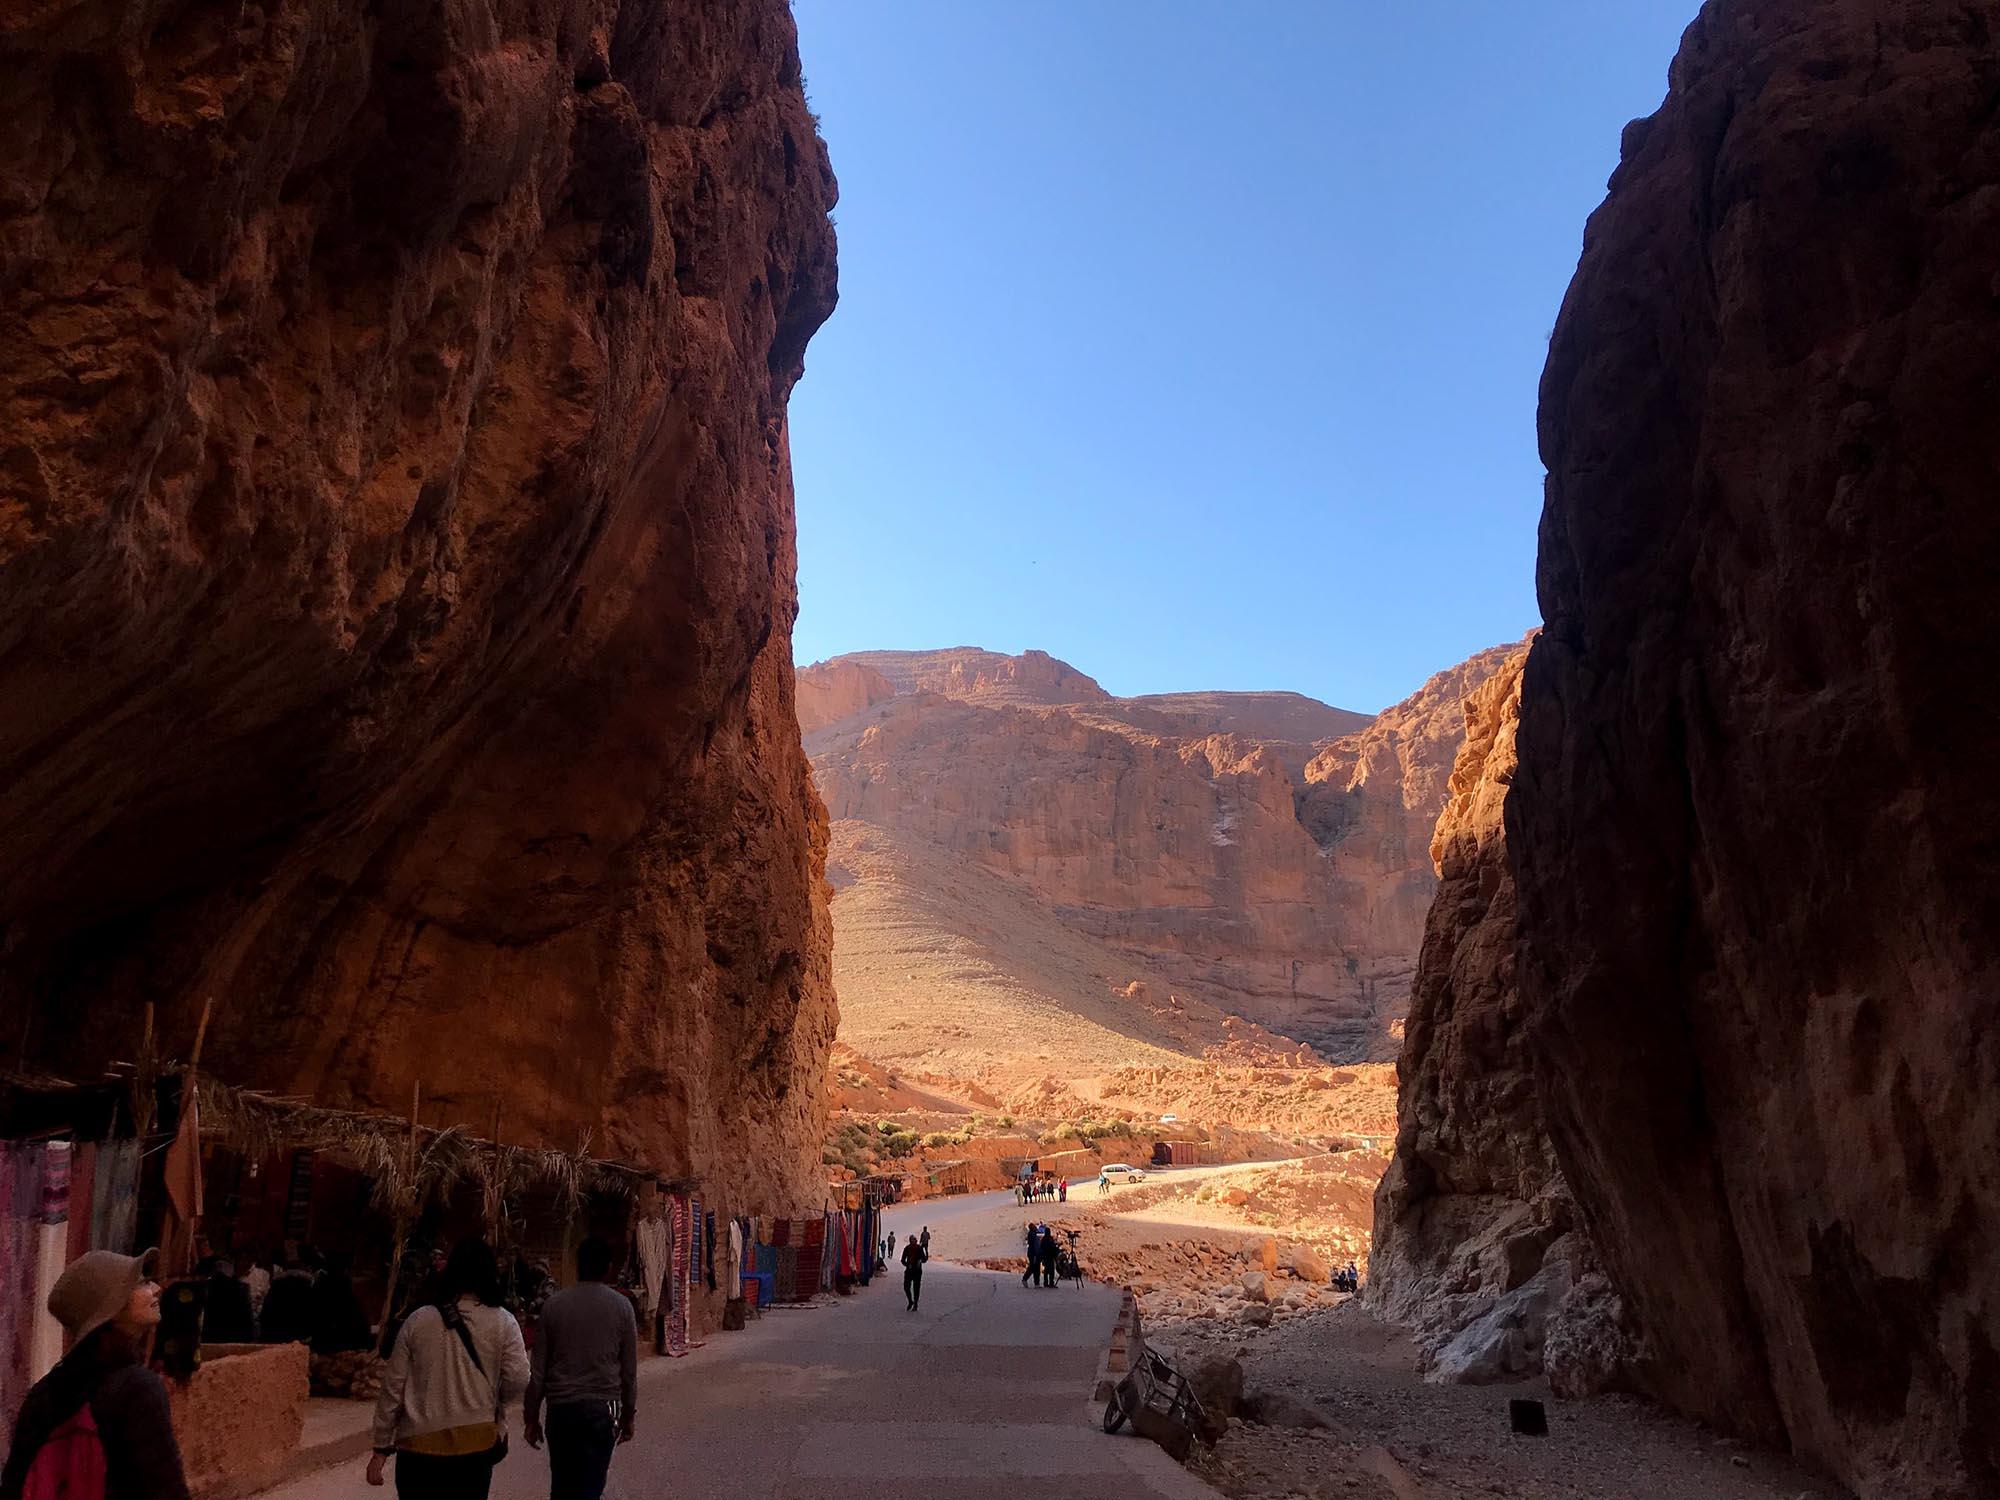 Marokko Koningssteden & Woestijn